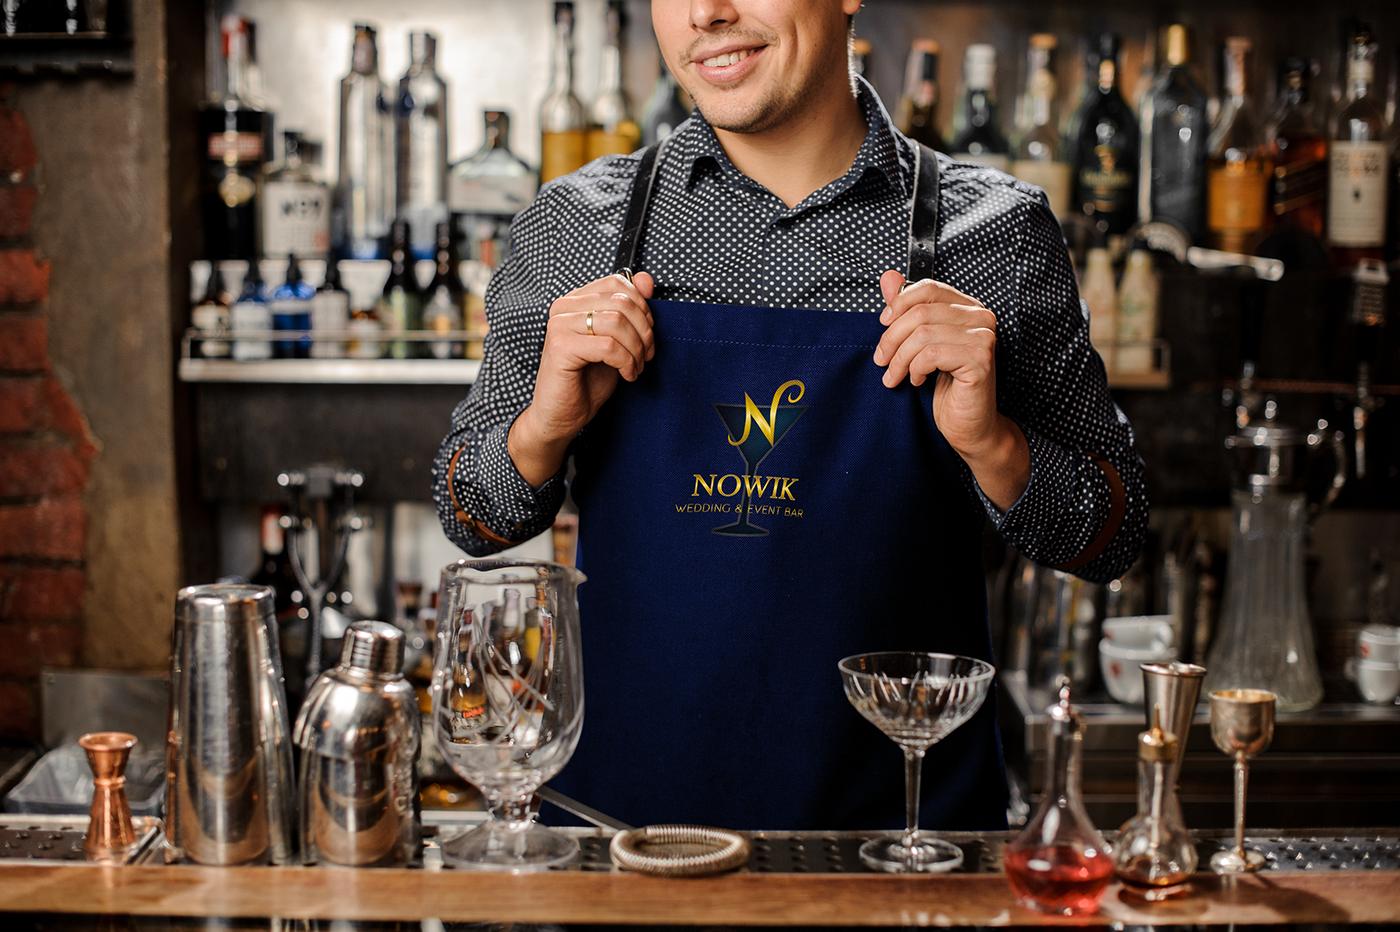 Nowik Mobile Bar